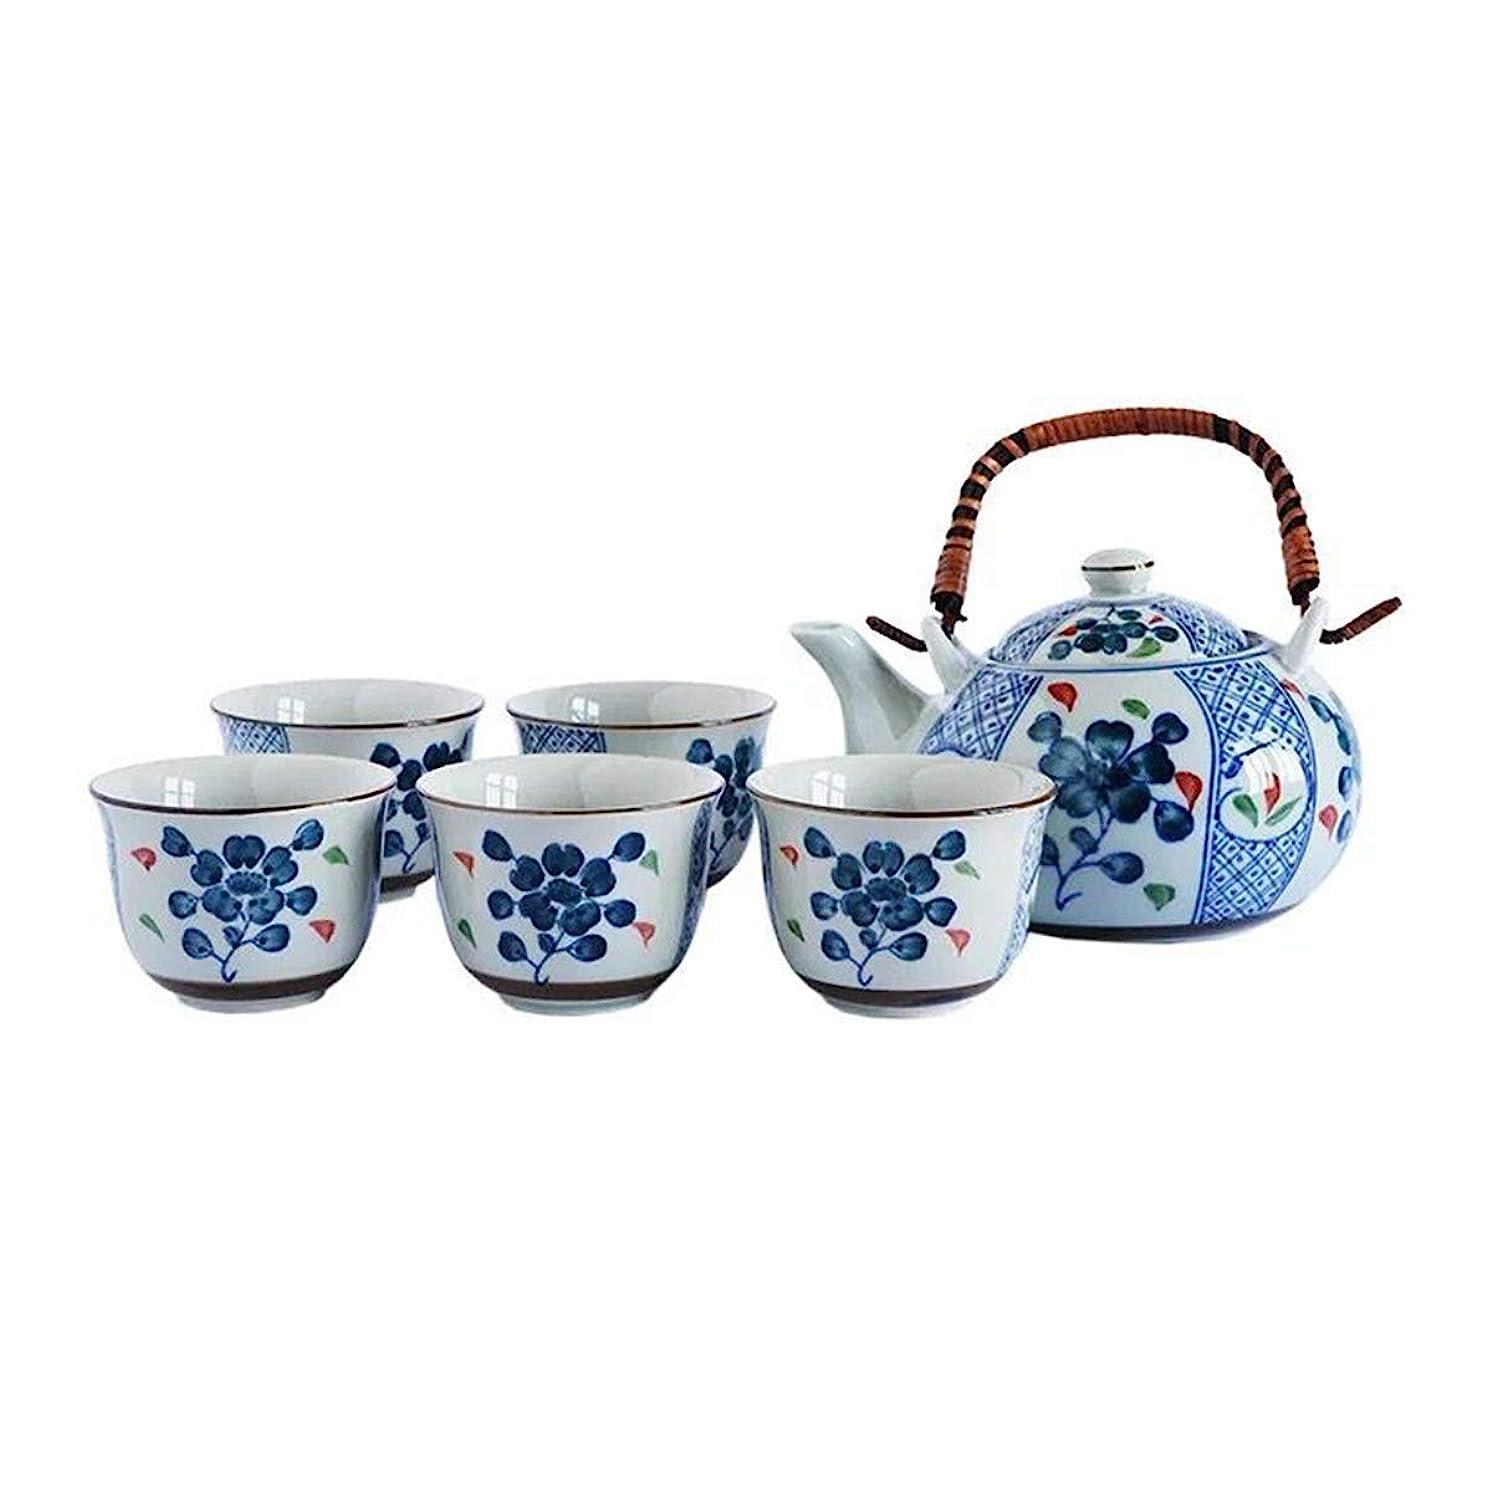 Umeware Best Handmade Japanese Ceramic Tea Set Gift With Teapot And 4 Tea Cups Set For Loose Leaf Tea, Blooming Tea And Tea Bags